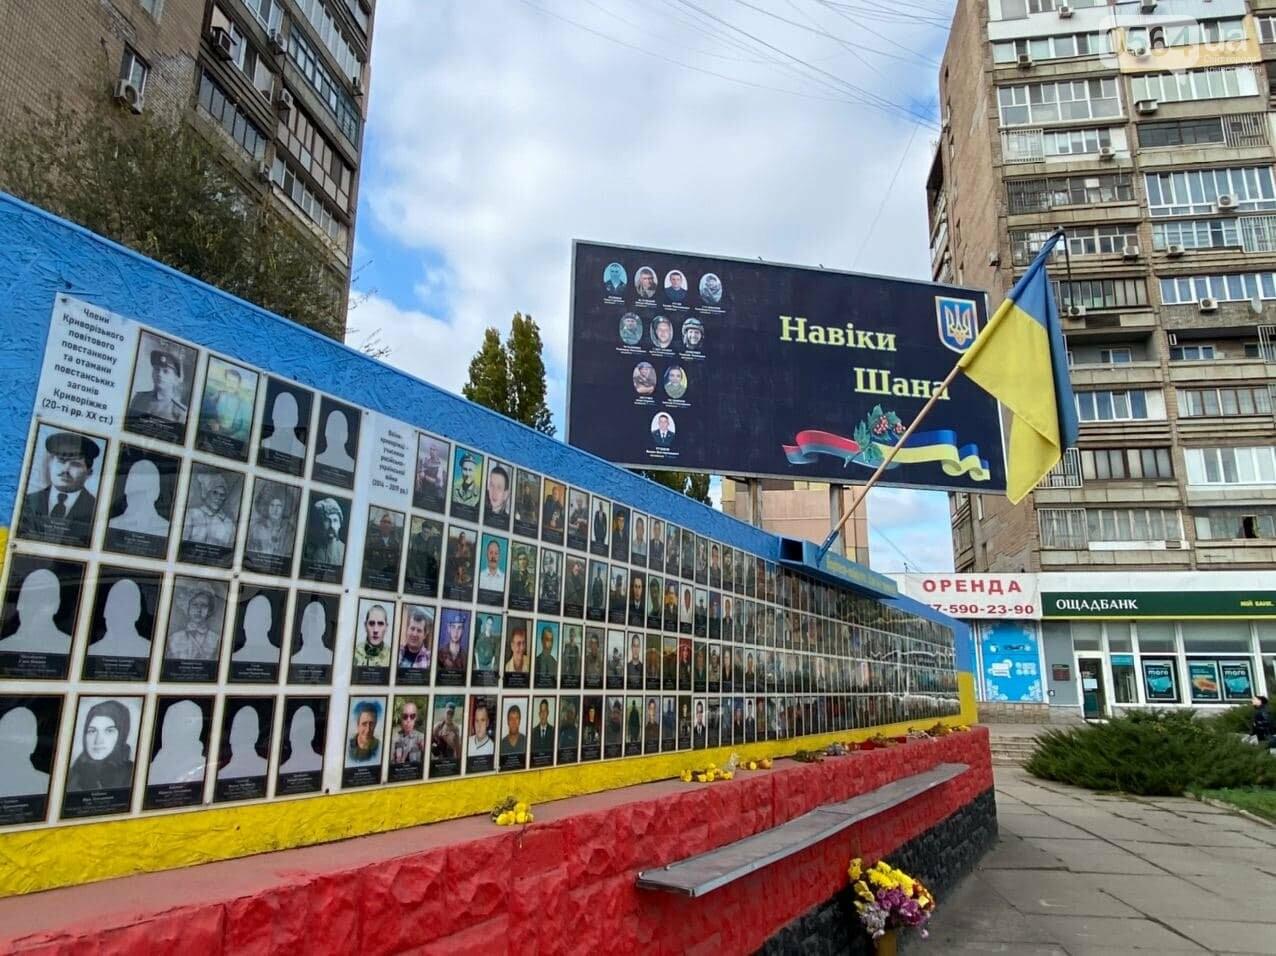 """Навіки шана"": В центре Кривого Рога разместили борд с фотографиями 10 погибших Героев, - ФОТО , фото-8"